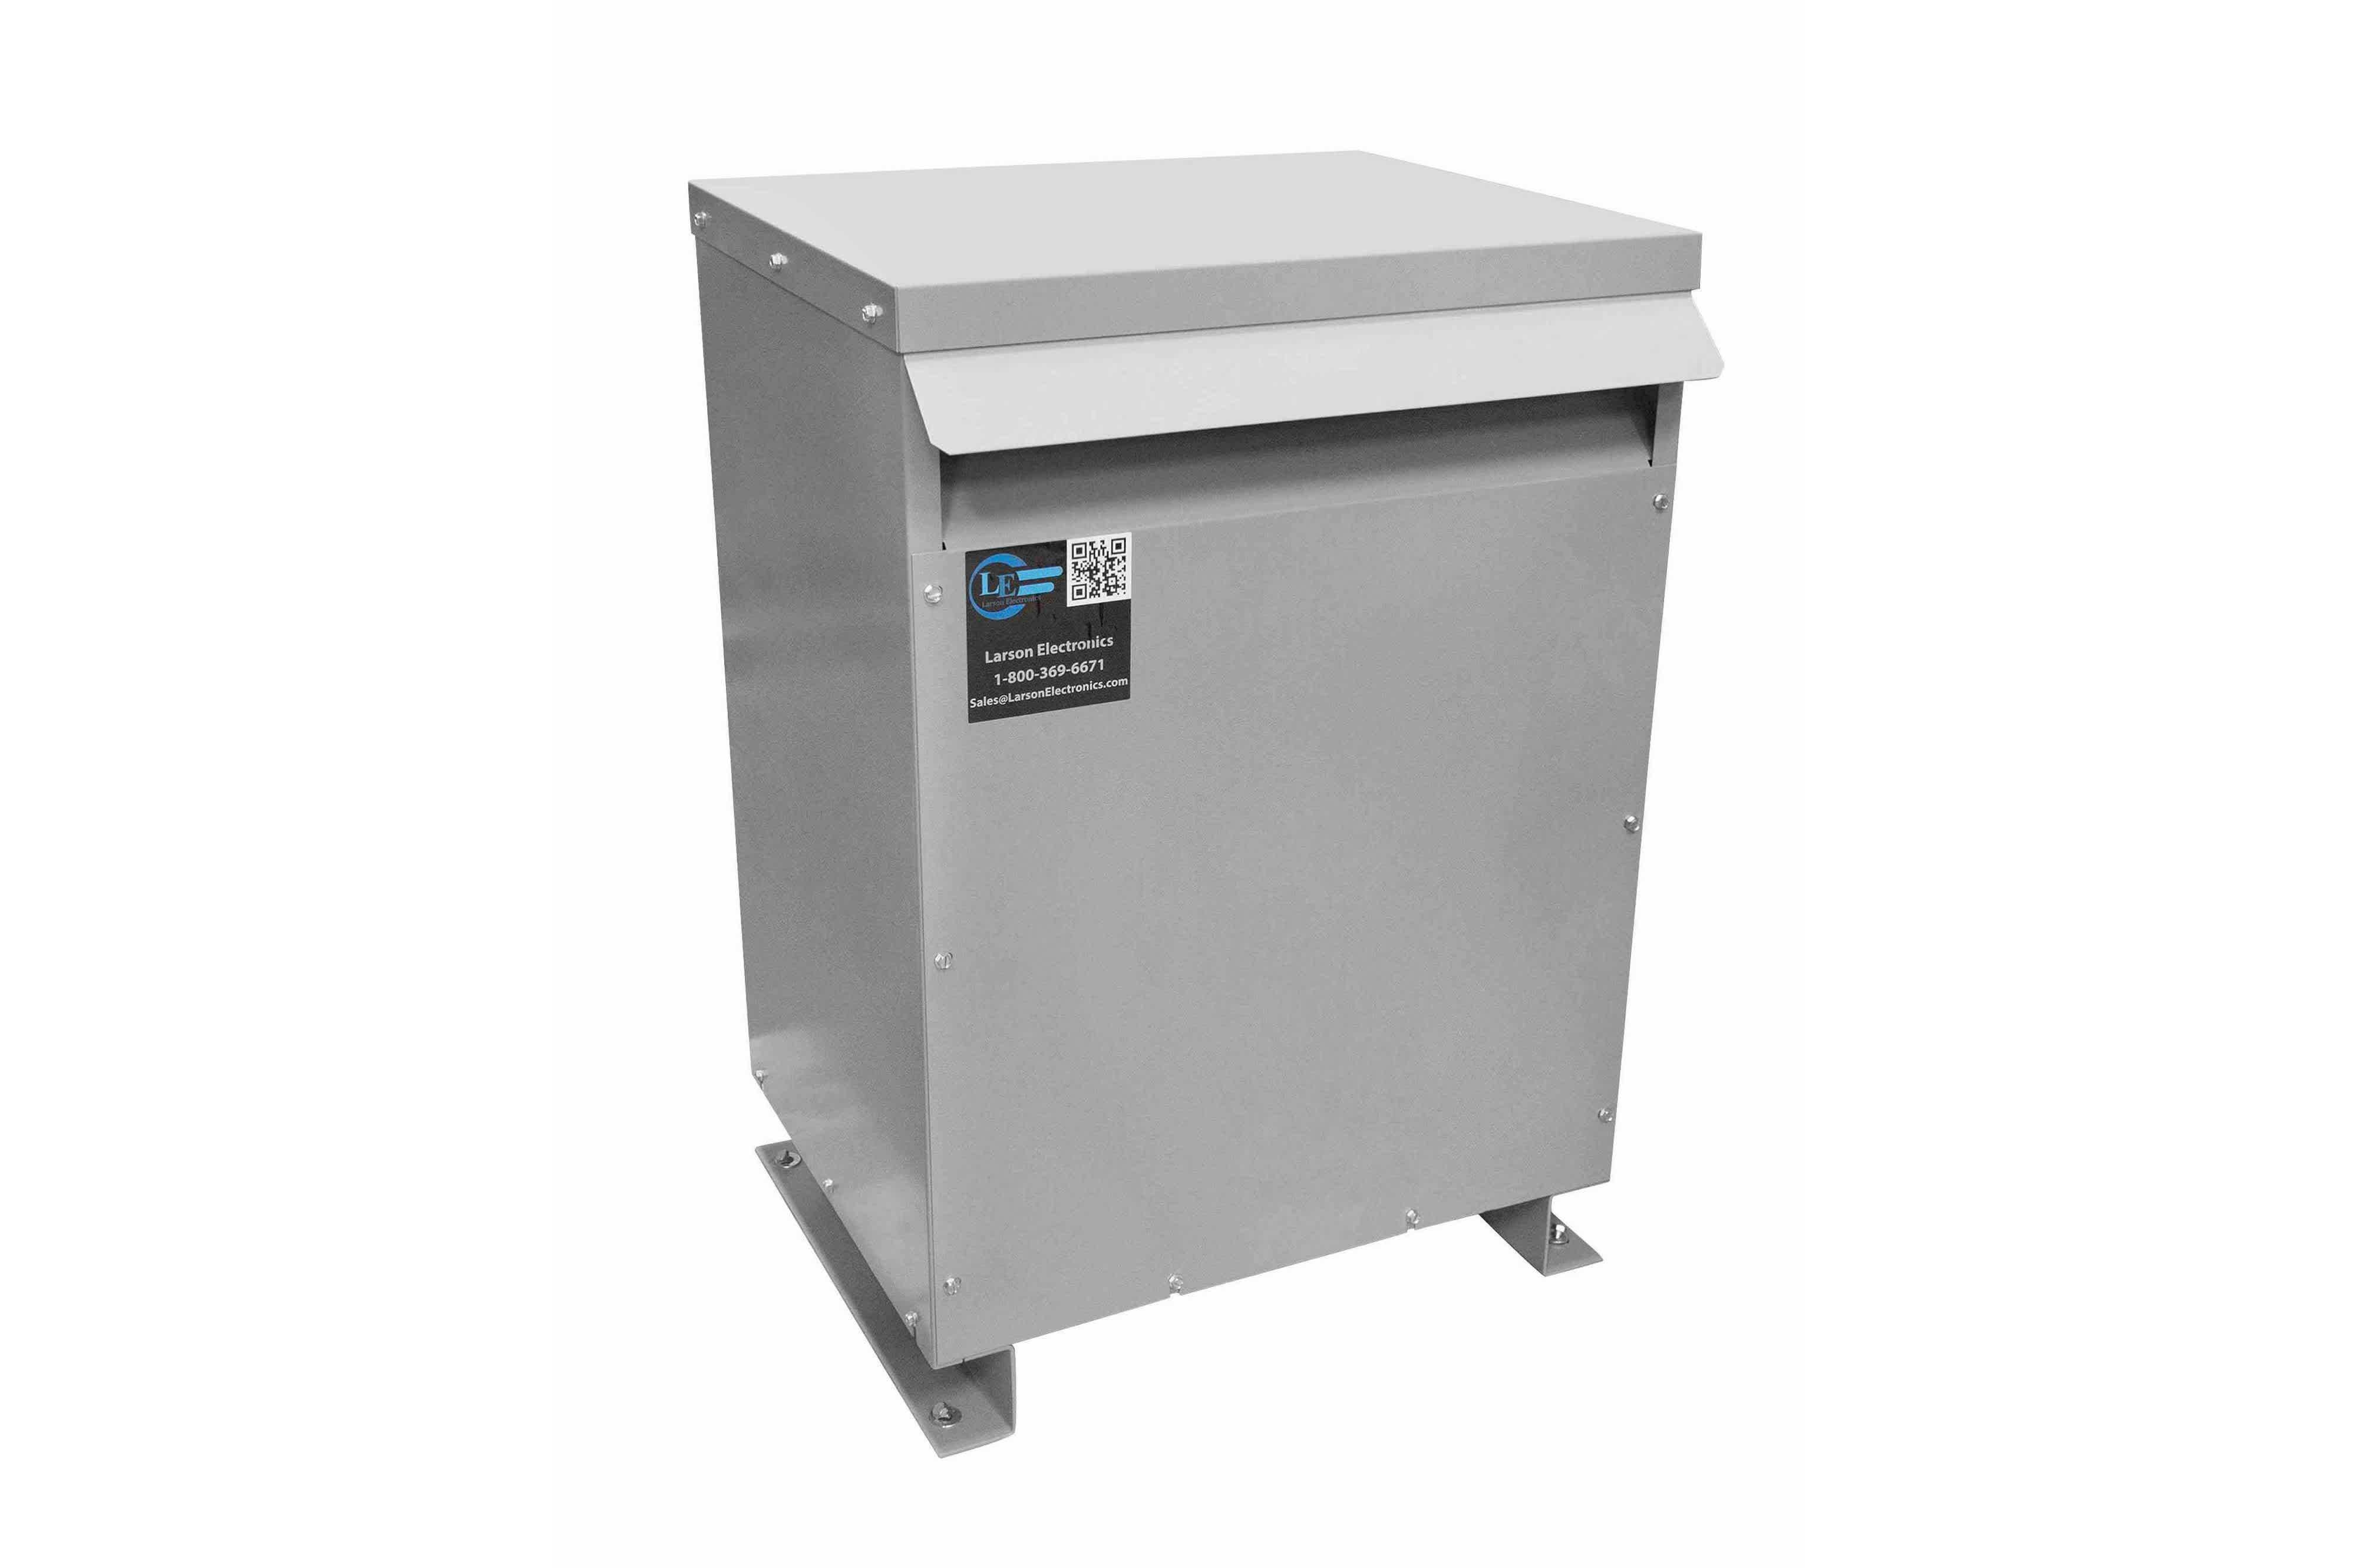 10 kVA 3PH Isolation Transformer, 575V Wye Primary, 208V Delta Secondary, N3R, Ventilated, 60 Hz